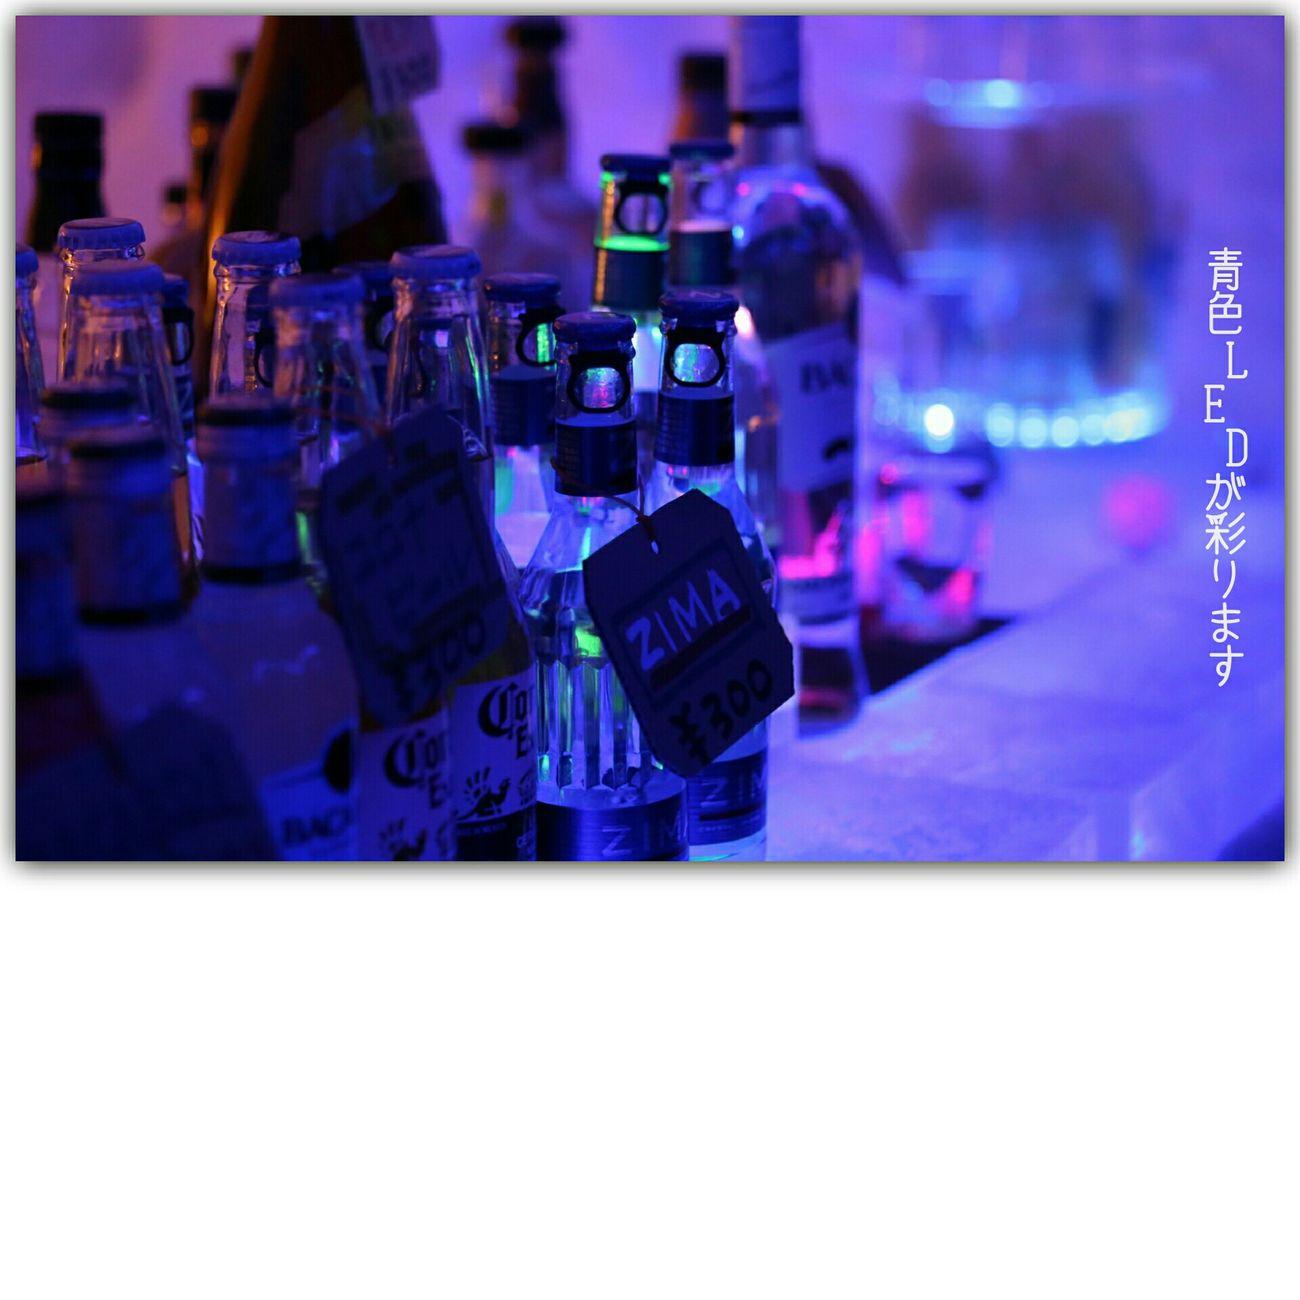 Ice Bar Snowfestival Bottles Alcohol Bottles Blue Led Lamp Light And Shadow Lighting 月山志津温泉雪旅籠の灯り